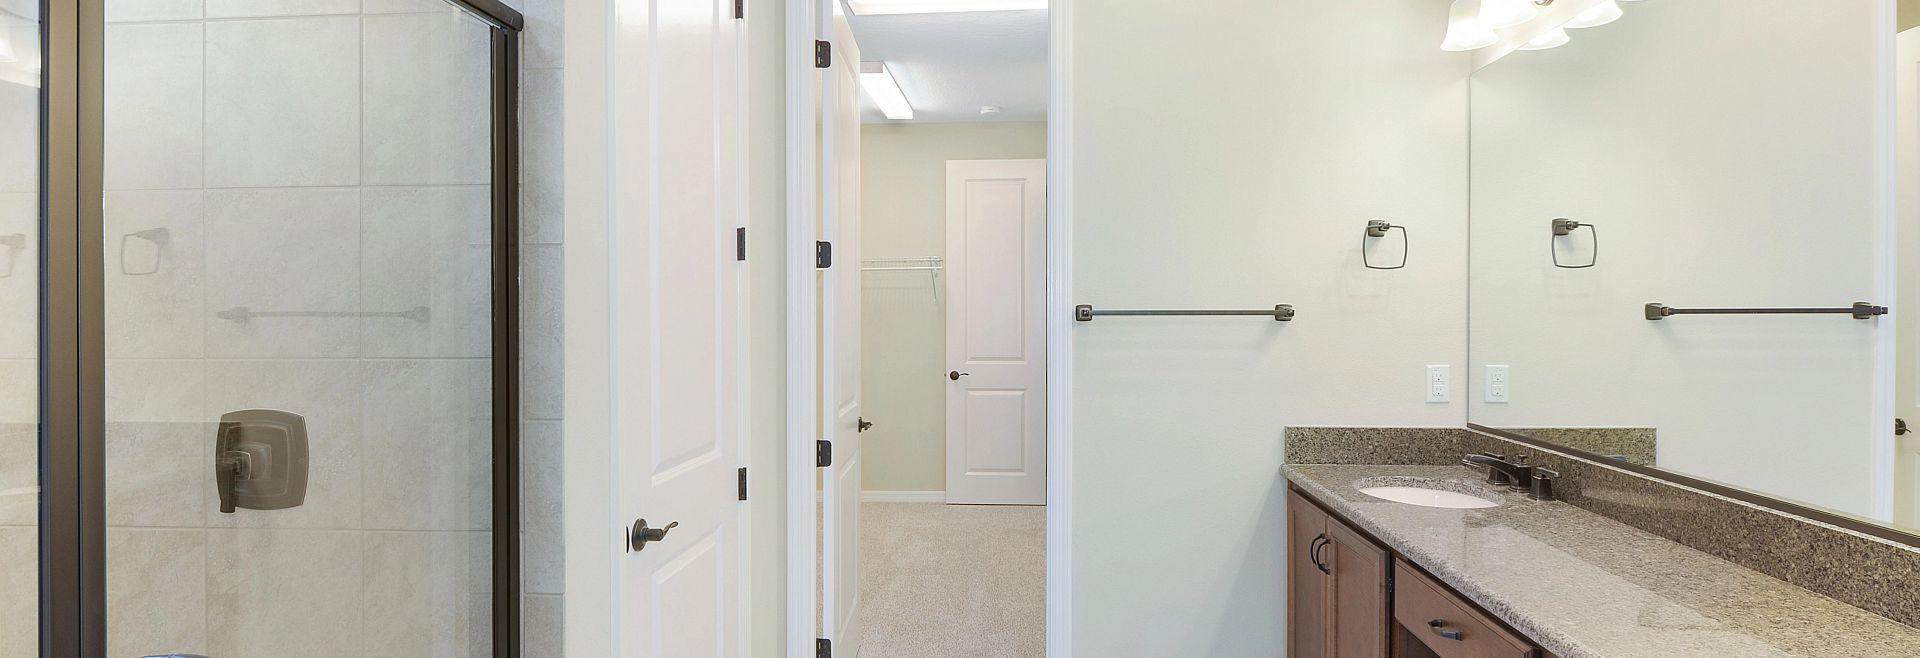 Trilogy at Ocala Preserve Quick Move In Home Refraesh Plan Master Bath